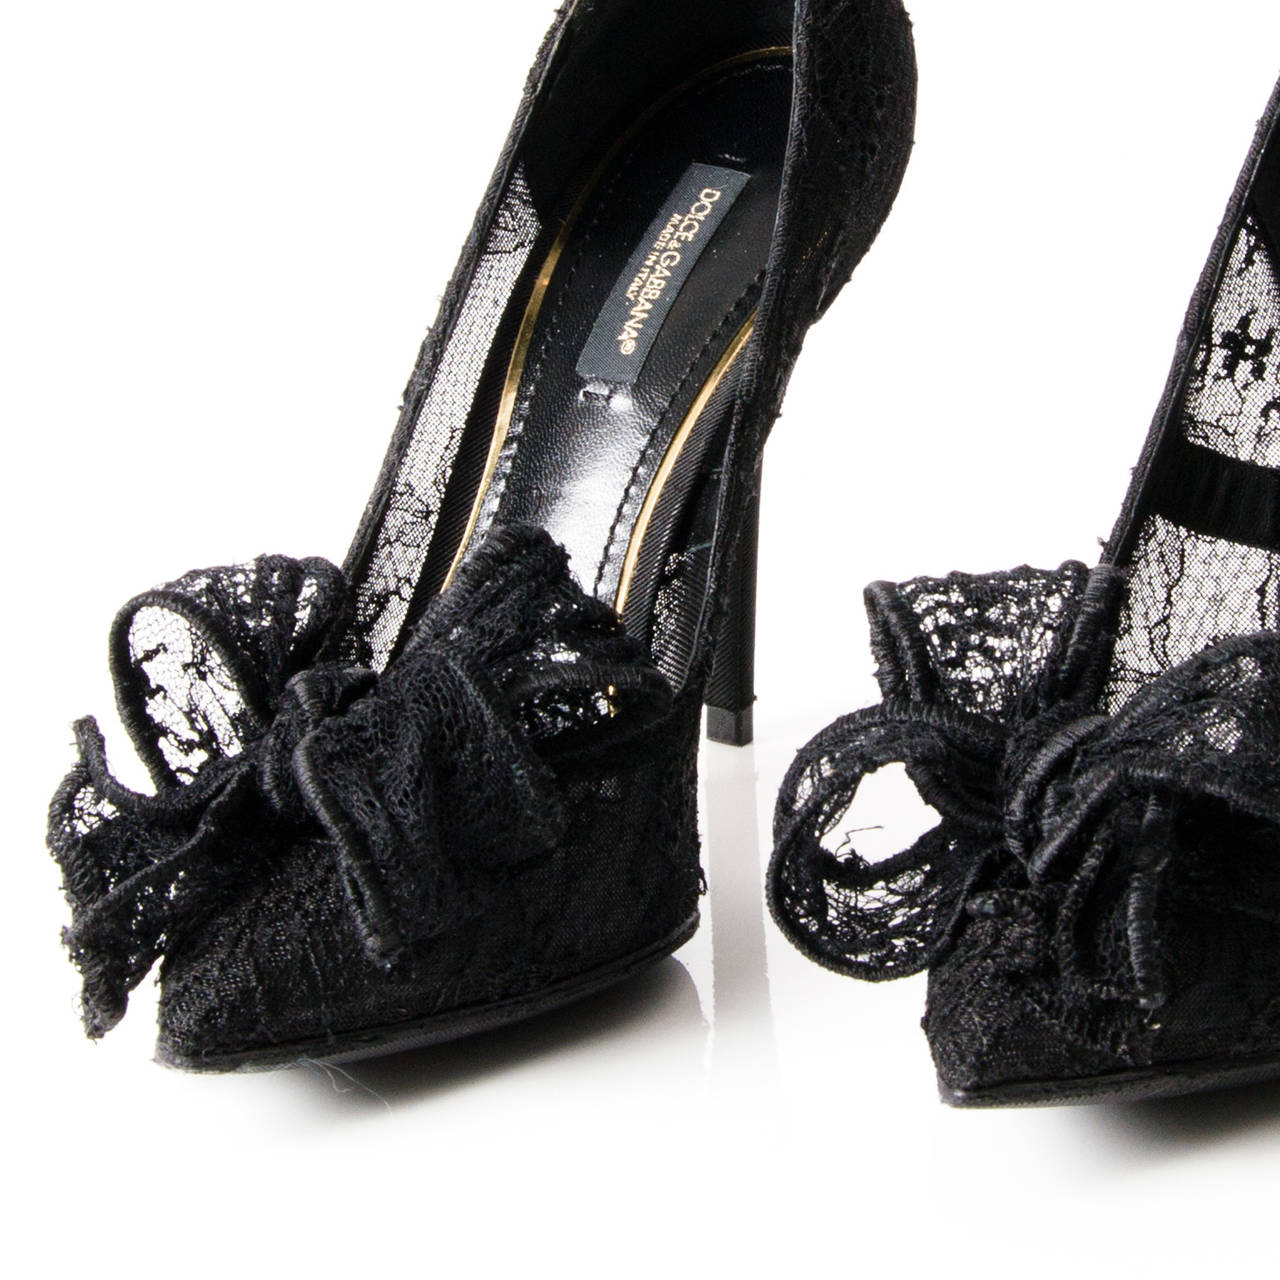 Dolce & Gabbana Black Chantilly Lace Bow Pumps 4